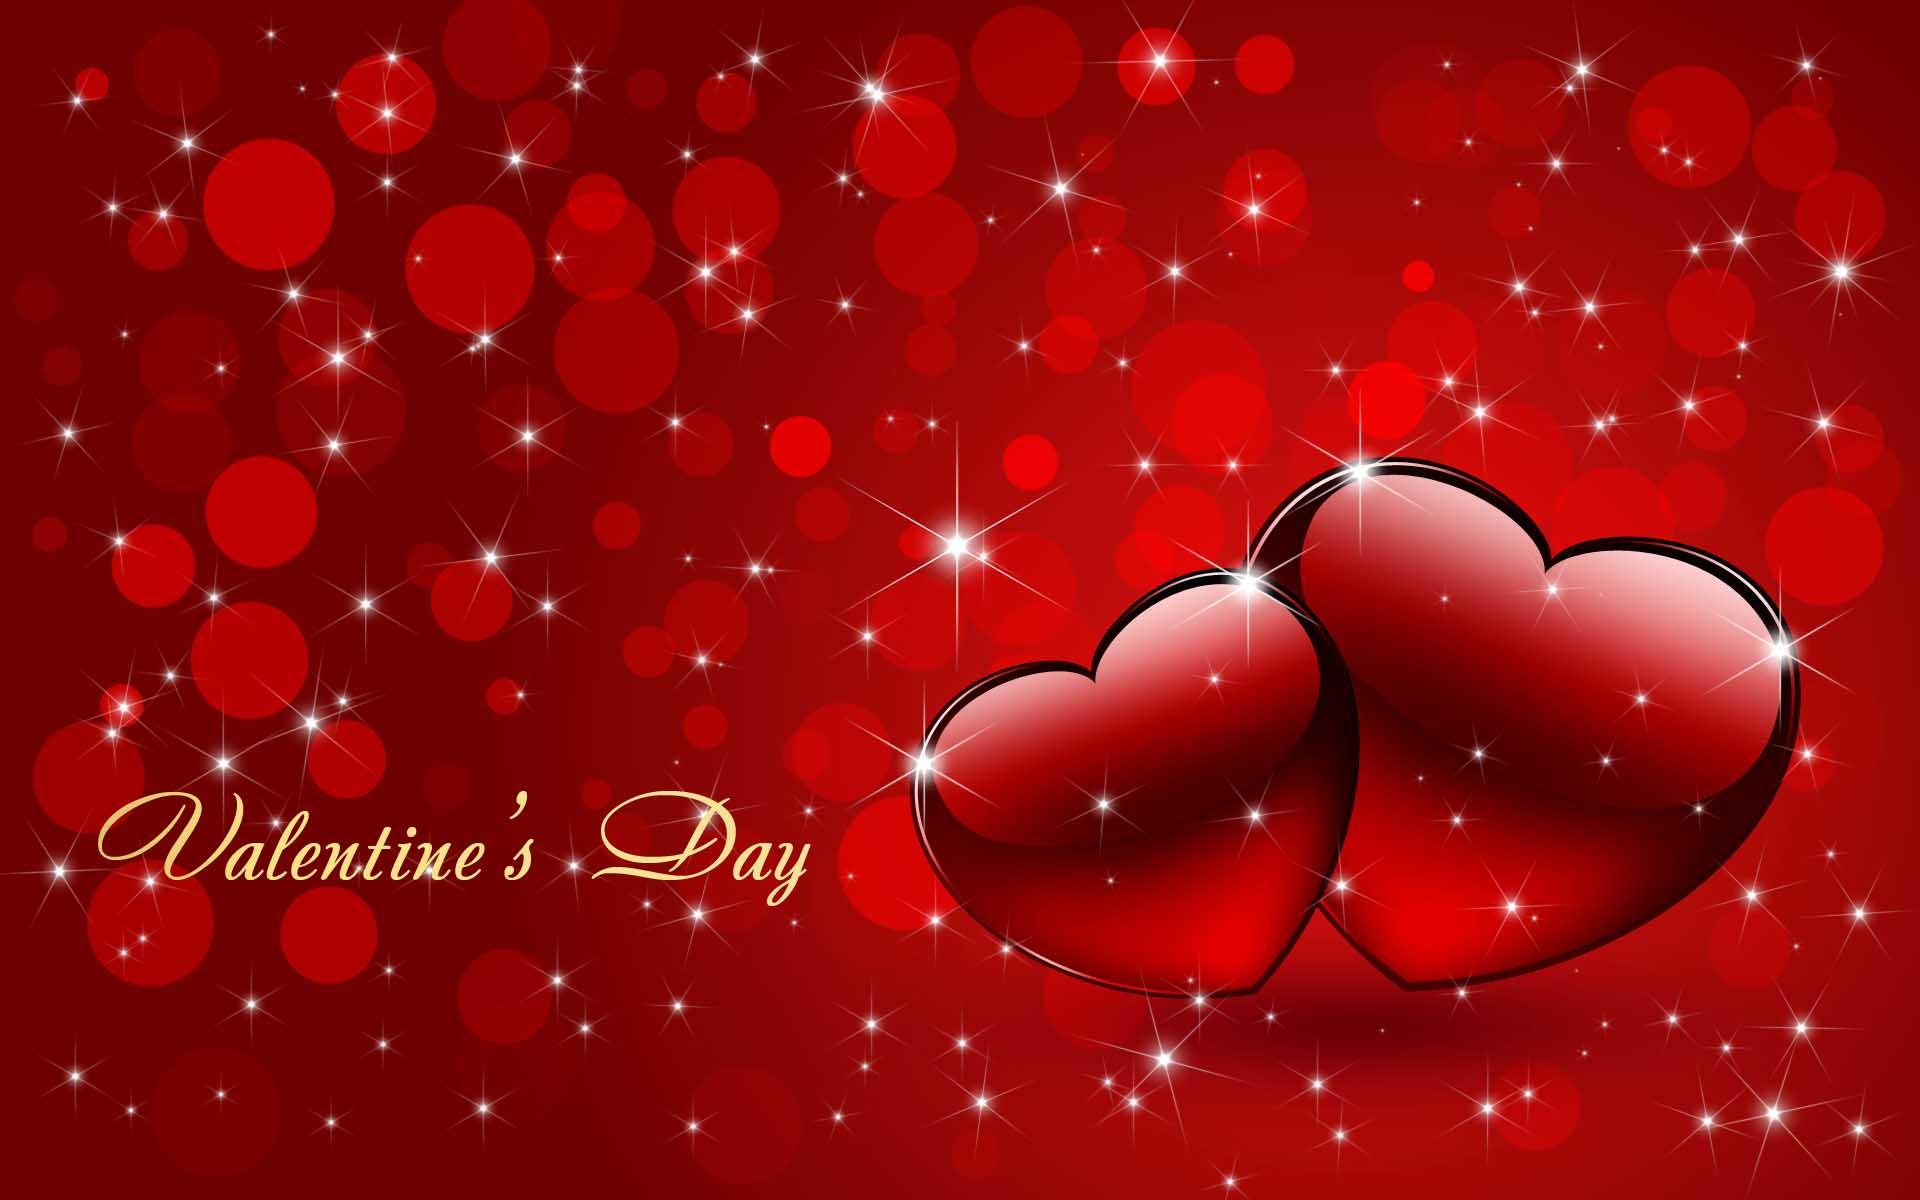 feliz_san_valentin__1__psd_by_gianferdinand-d5axvh2